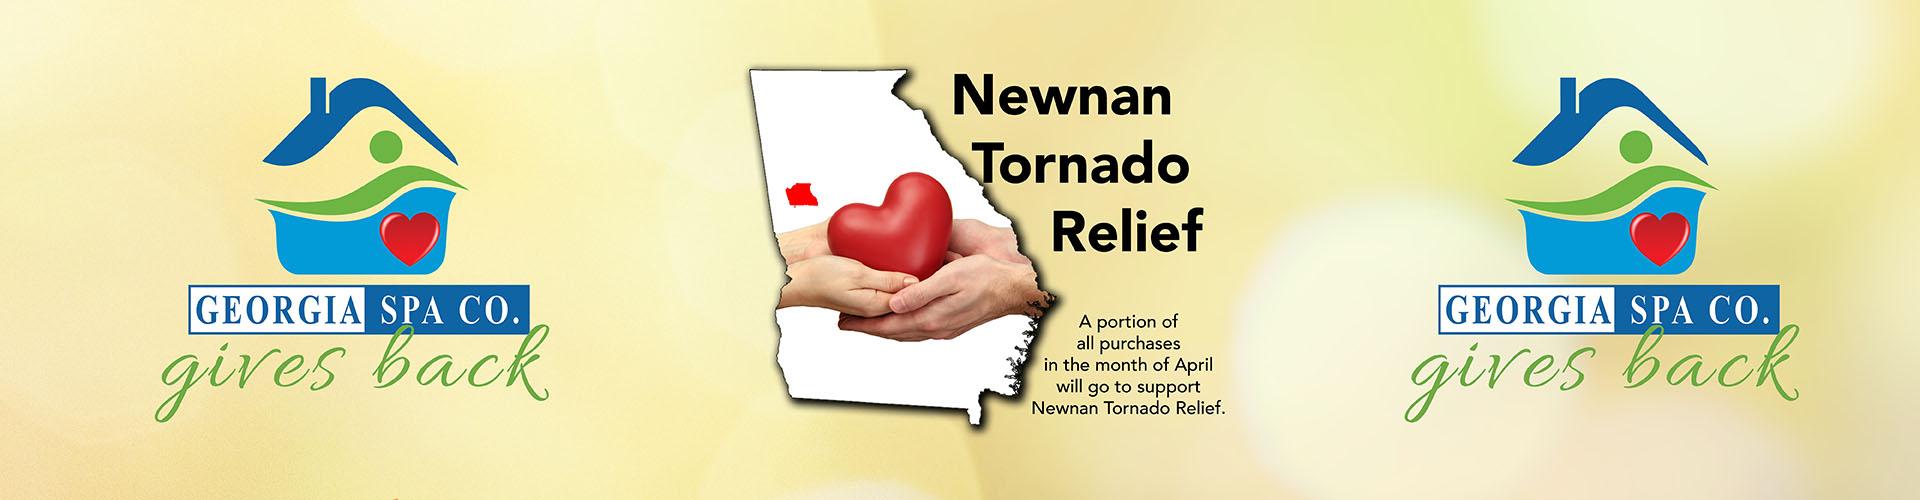 Gives Back Newnan Tornado Relief